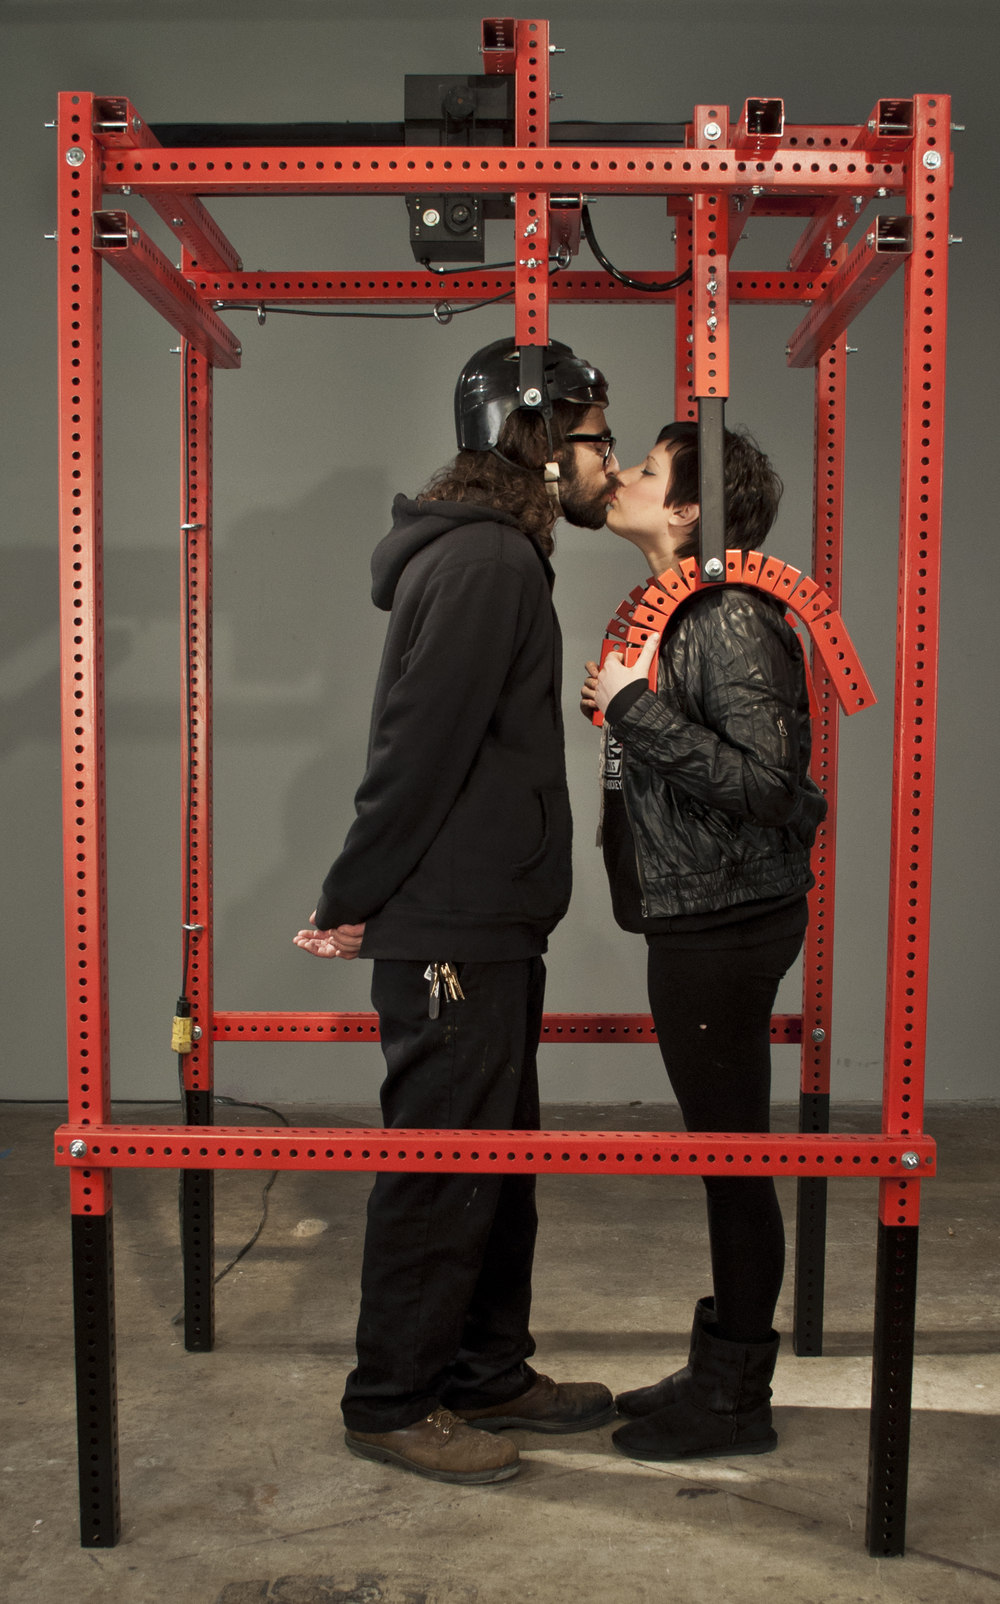 Camut_Kissing2.jpg